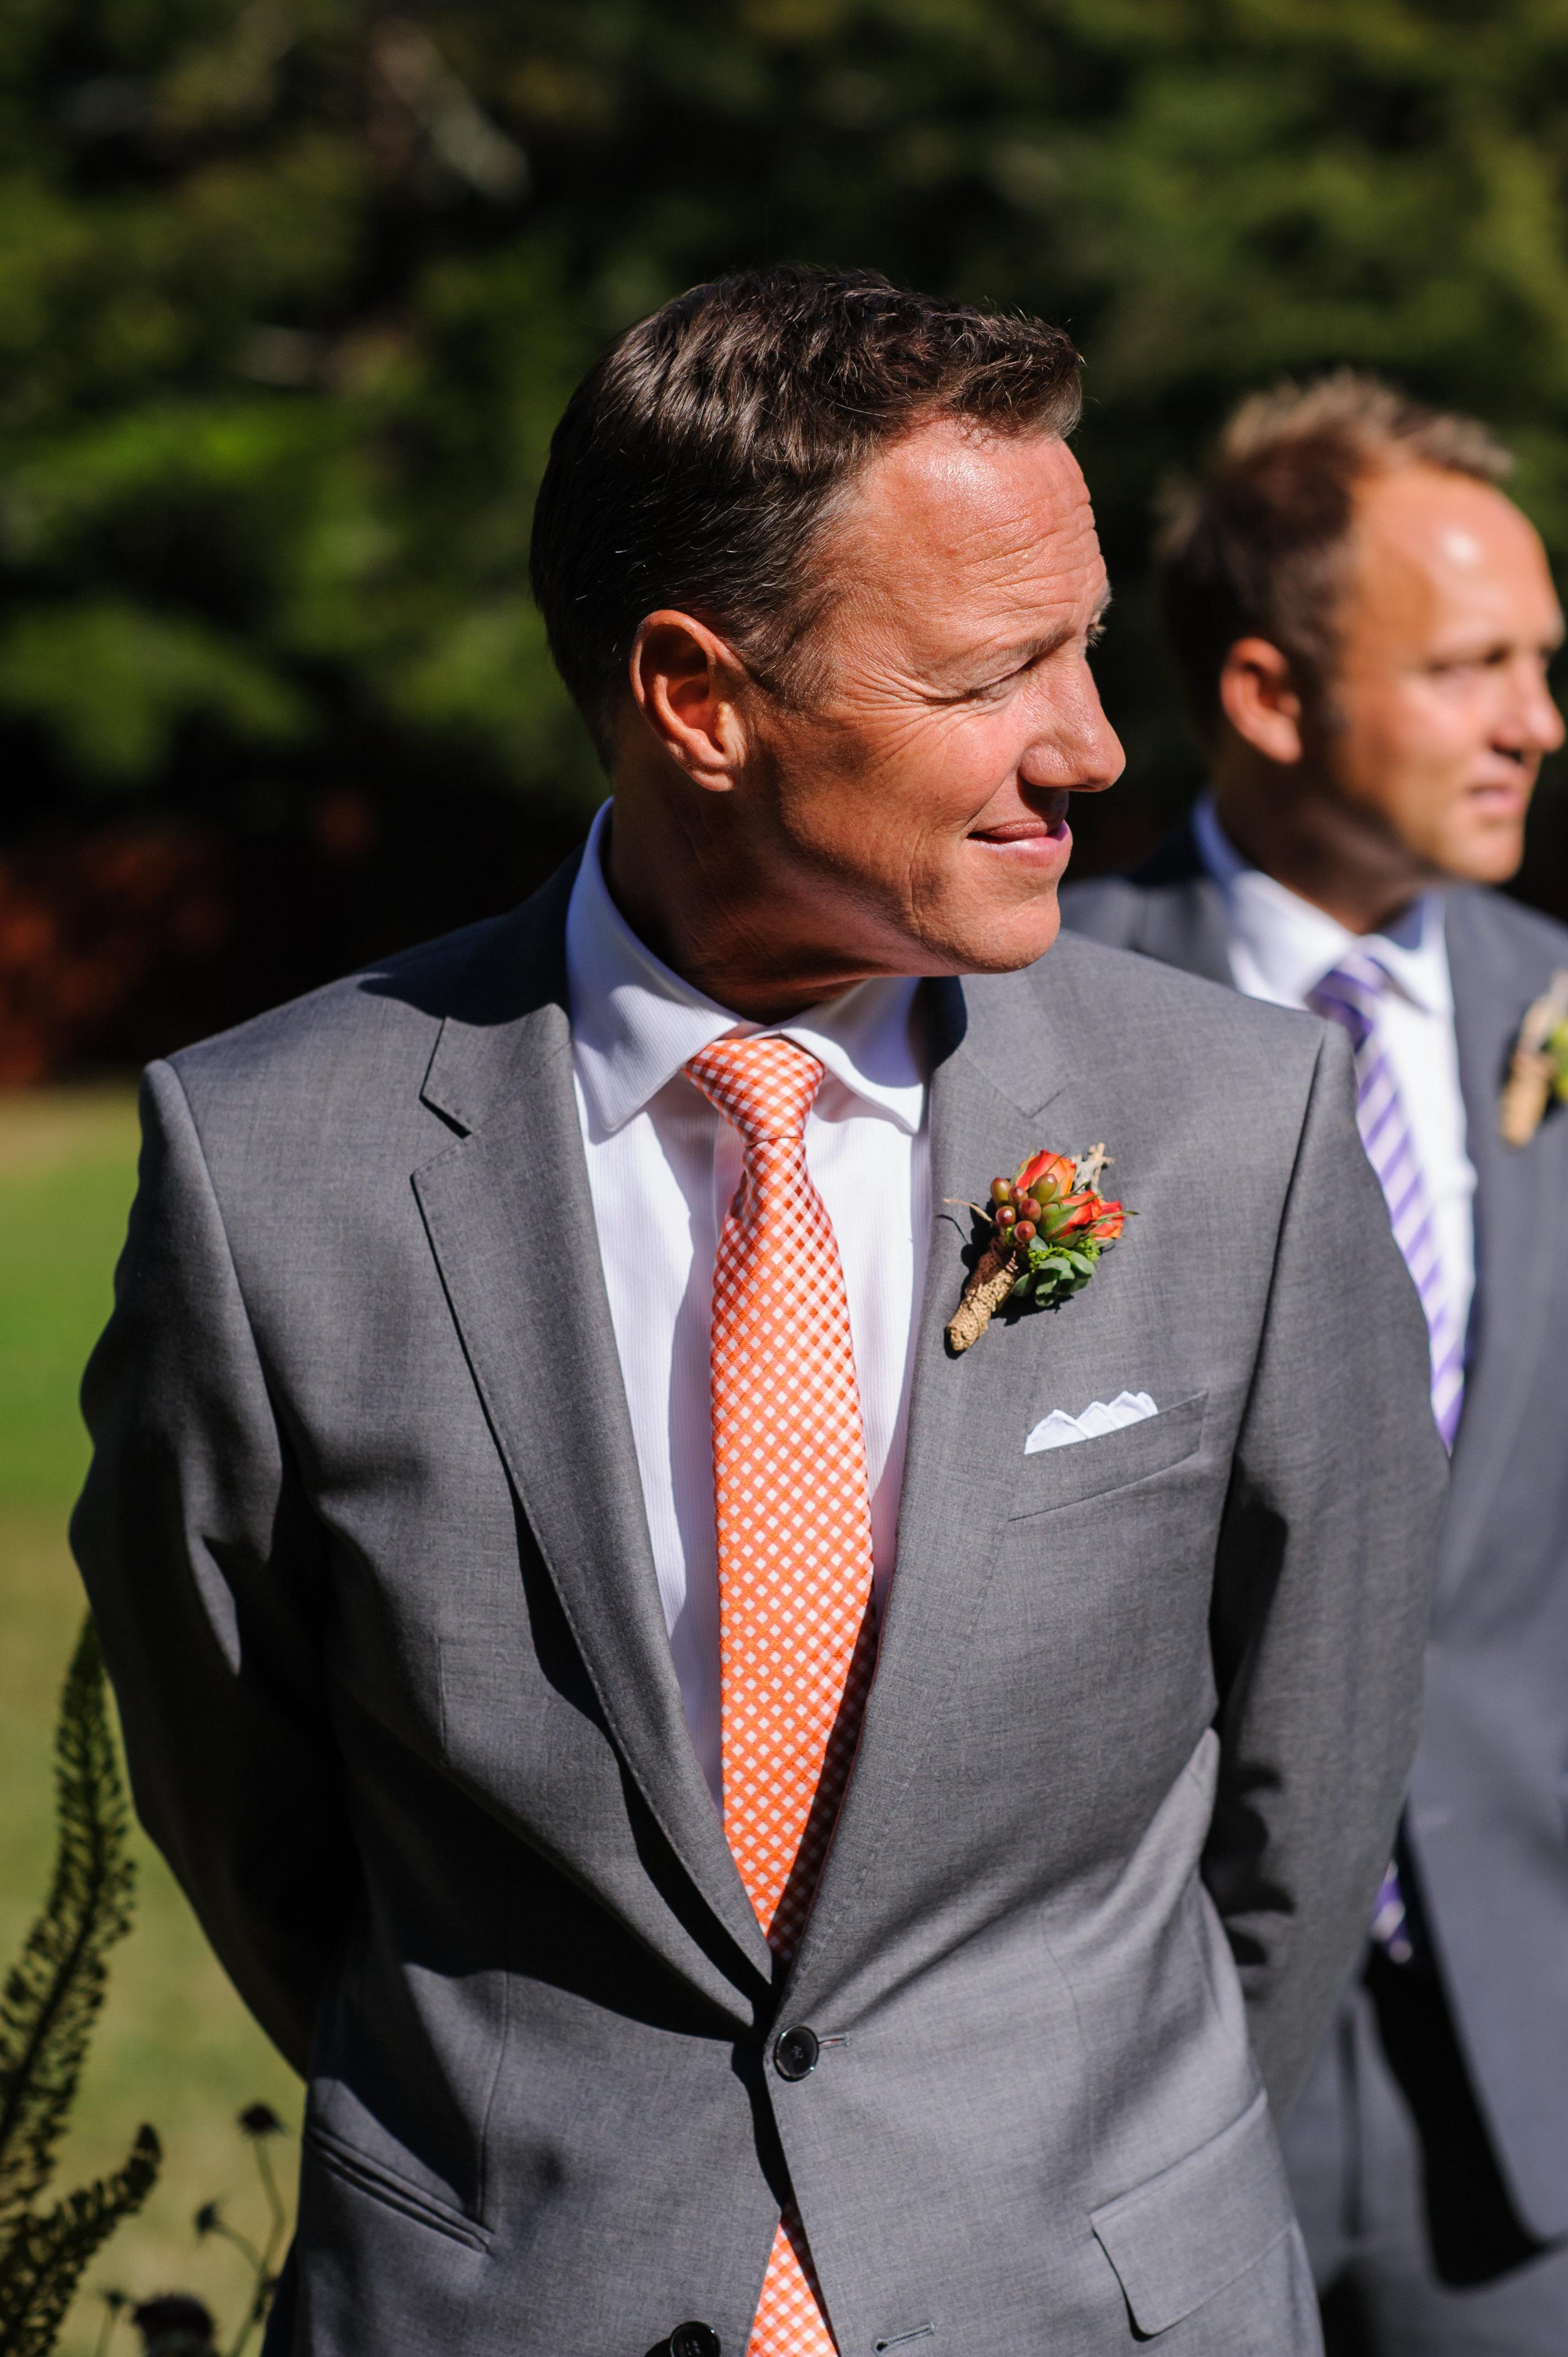 janet-jeremy-015-mountain-terrace-woodside-wedding-photographer-katherine-nicole-photography.JPG